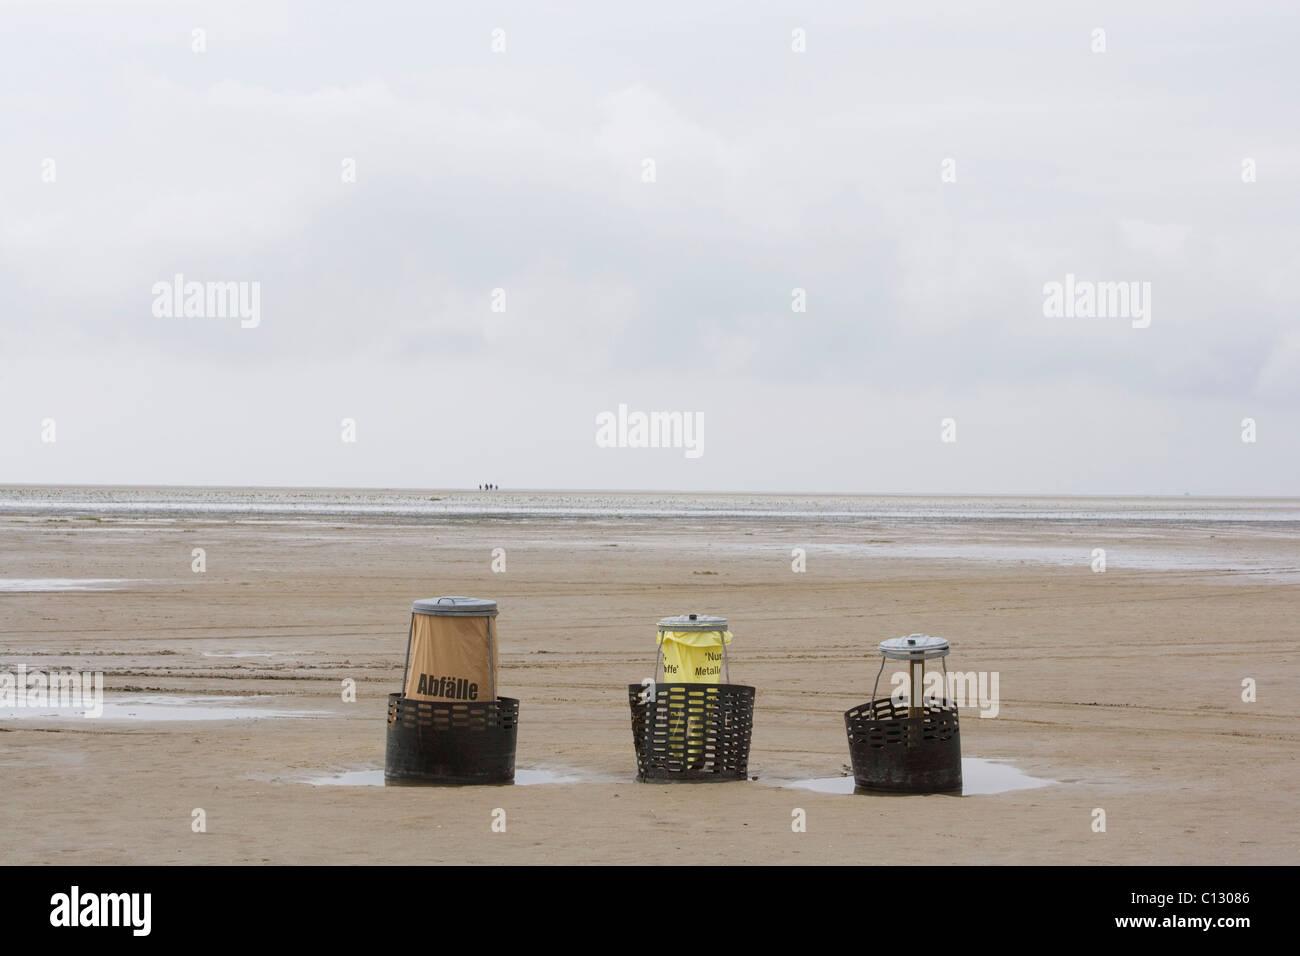 wastebaskets on empty beach - Stock Image